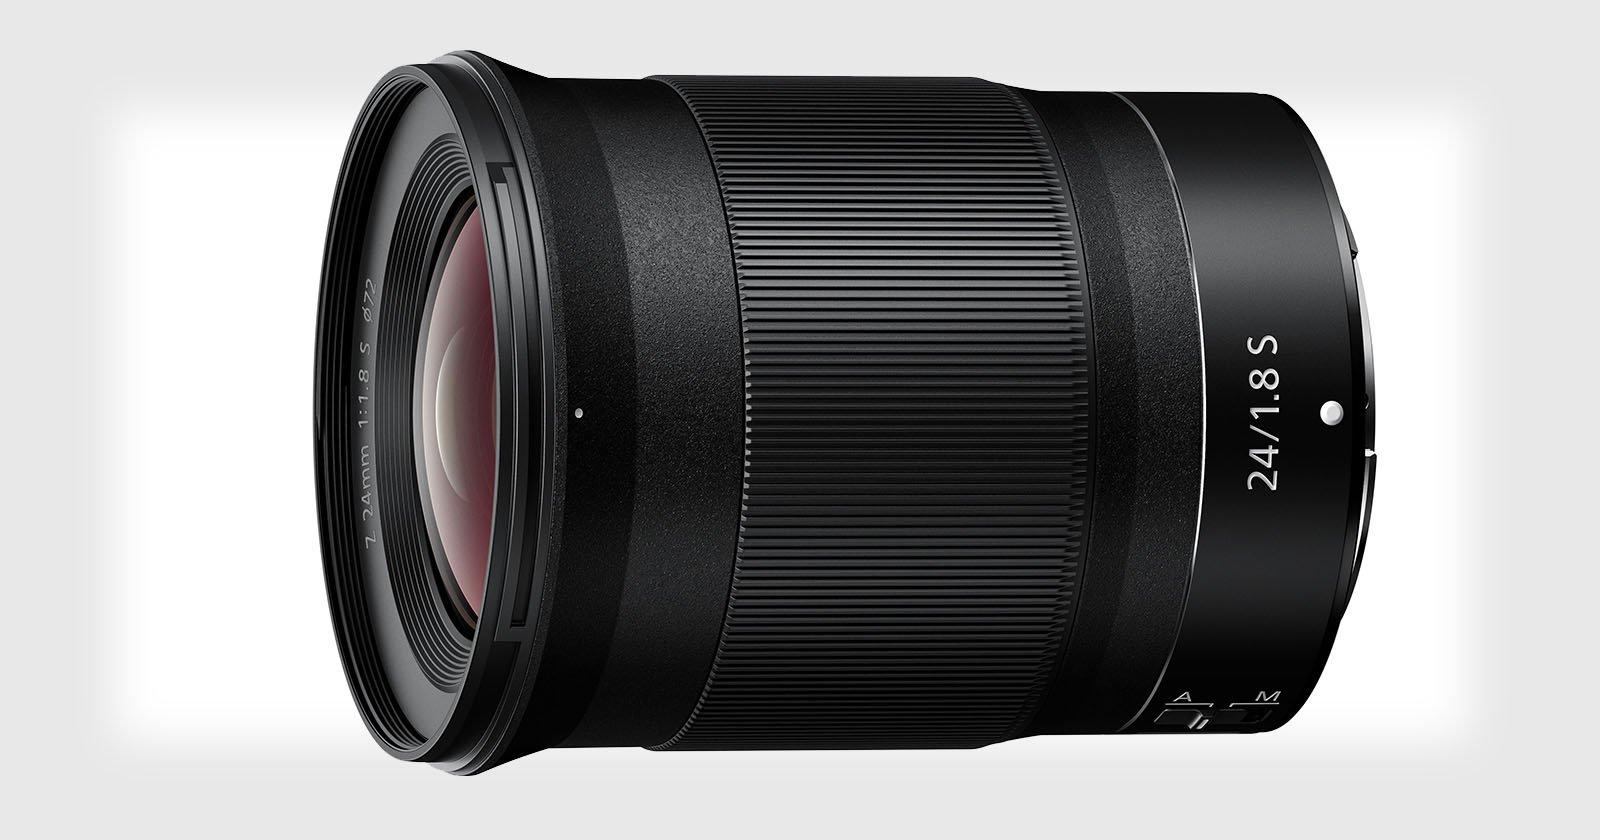 Nikon Unveils the Nikkor Z 24mm f/1.8 S Mirrorless Lens